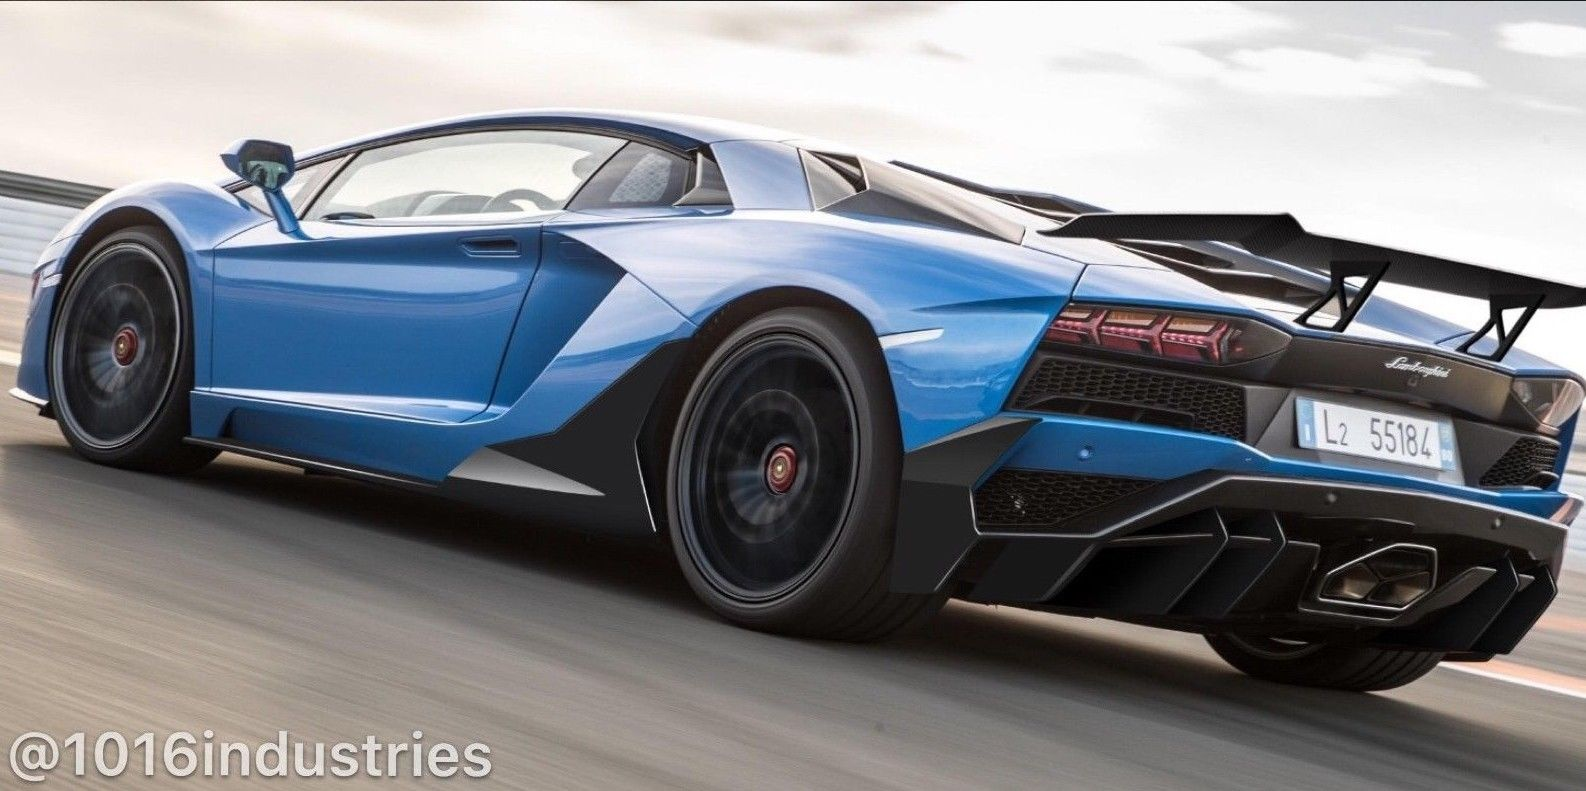 Amazing Lamborghini Huracan Aventador S Lp740 Carbon Fiber Rear Wing